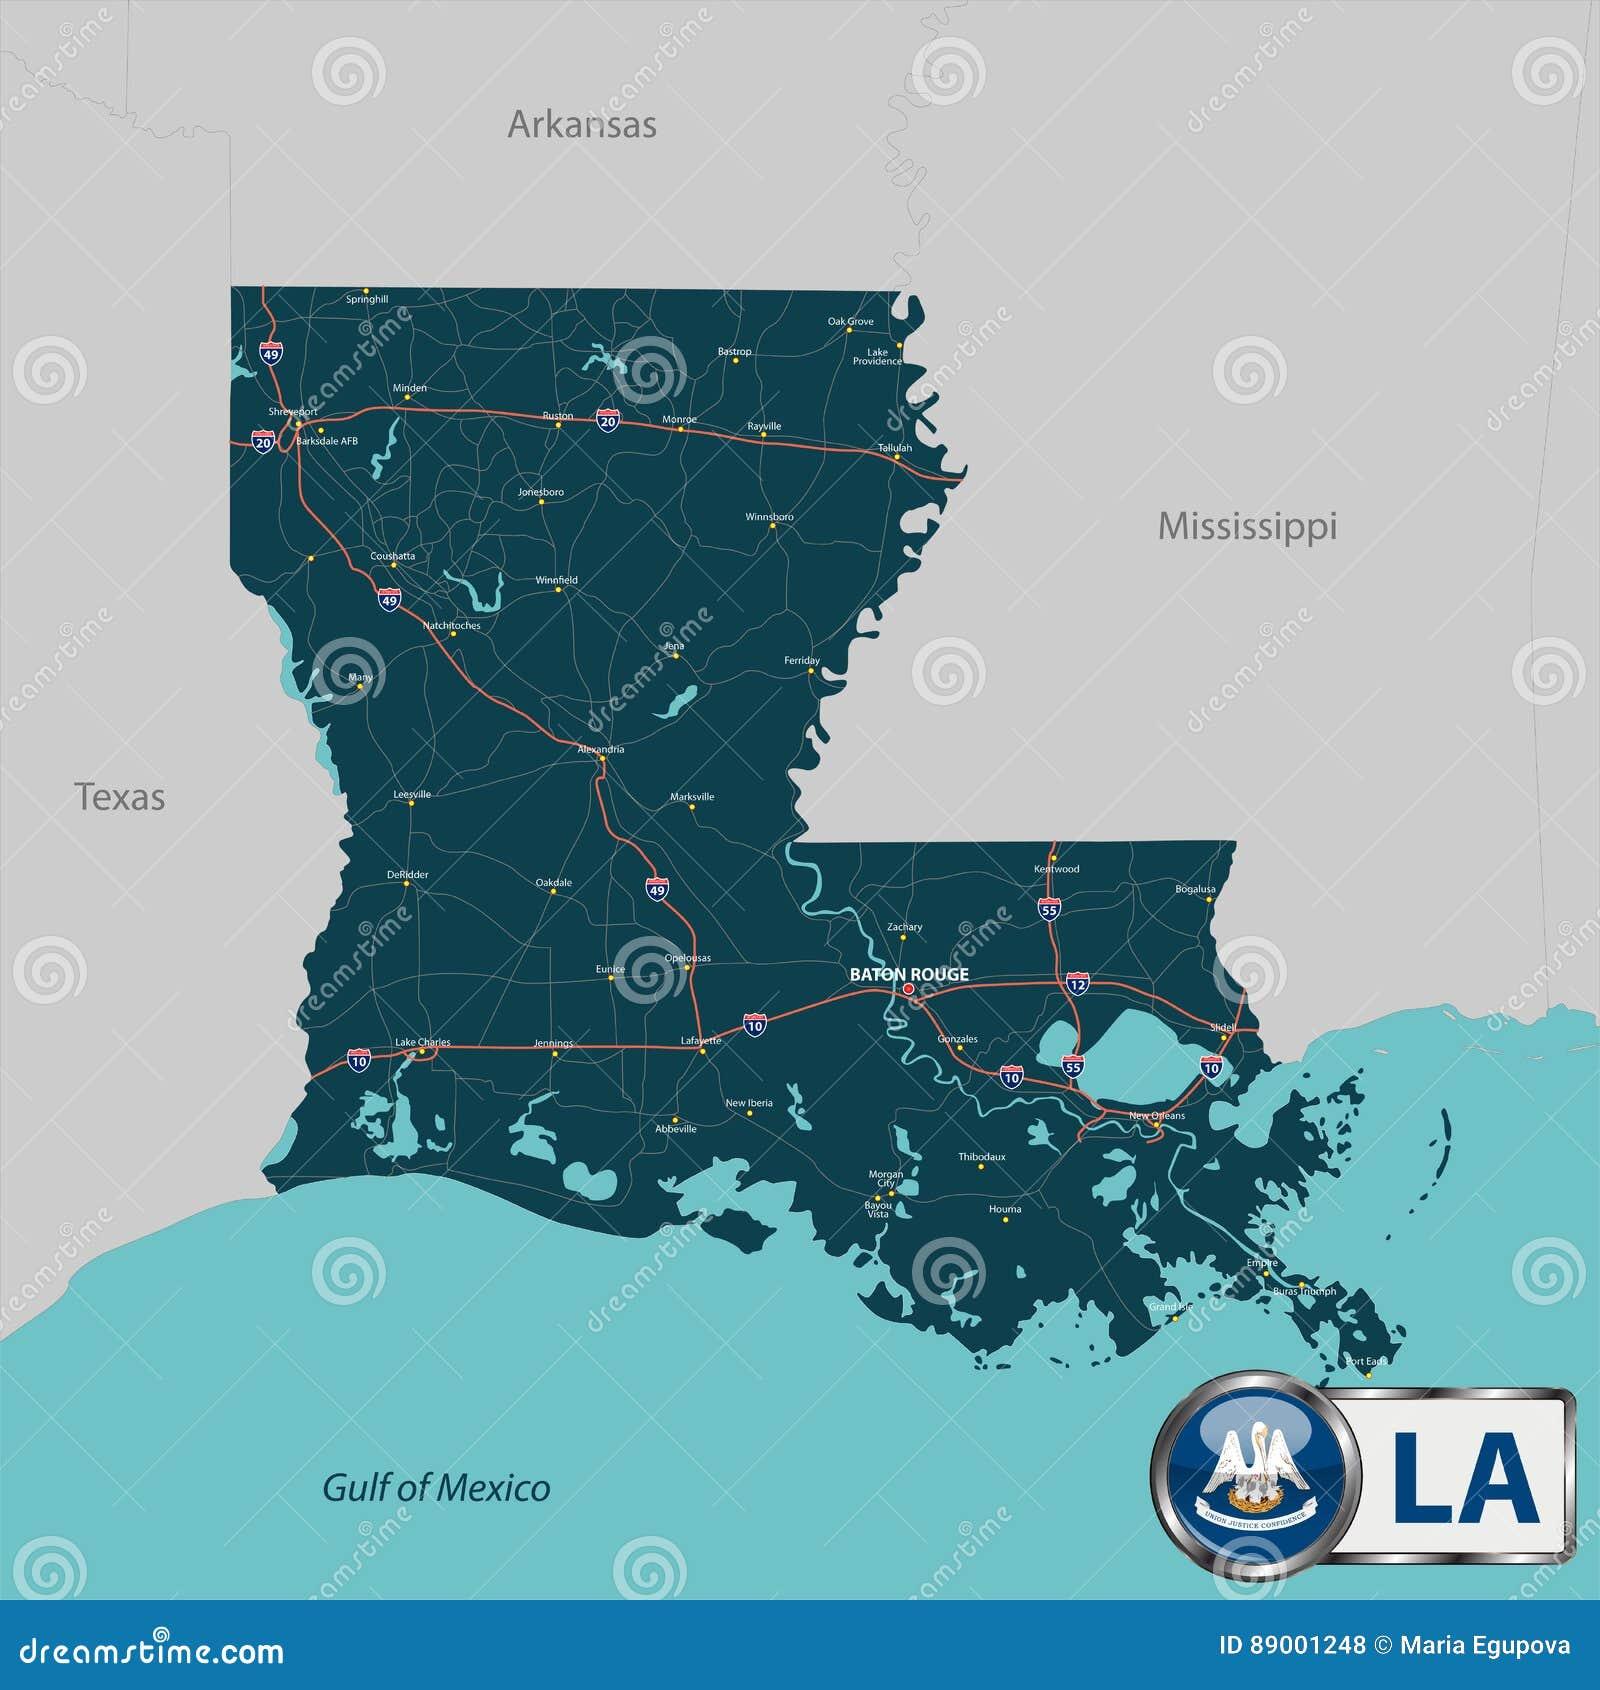 Interstate Map Of Louisiana.Map Of State Louisiana Usa Stock Vector Illustration Of Roads